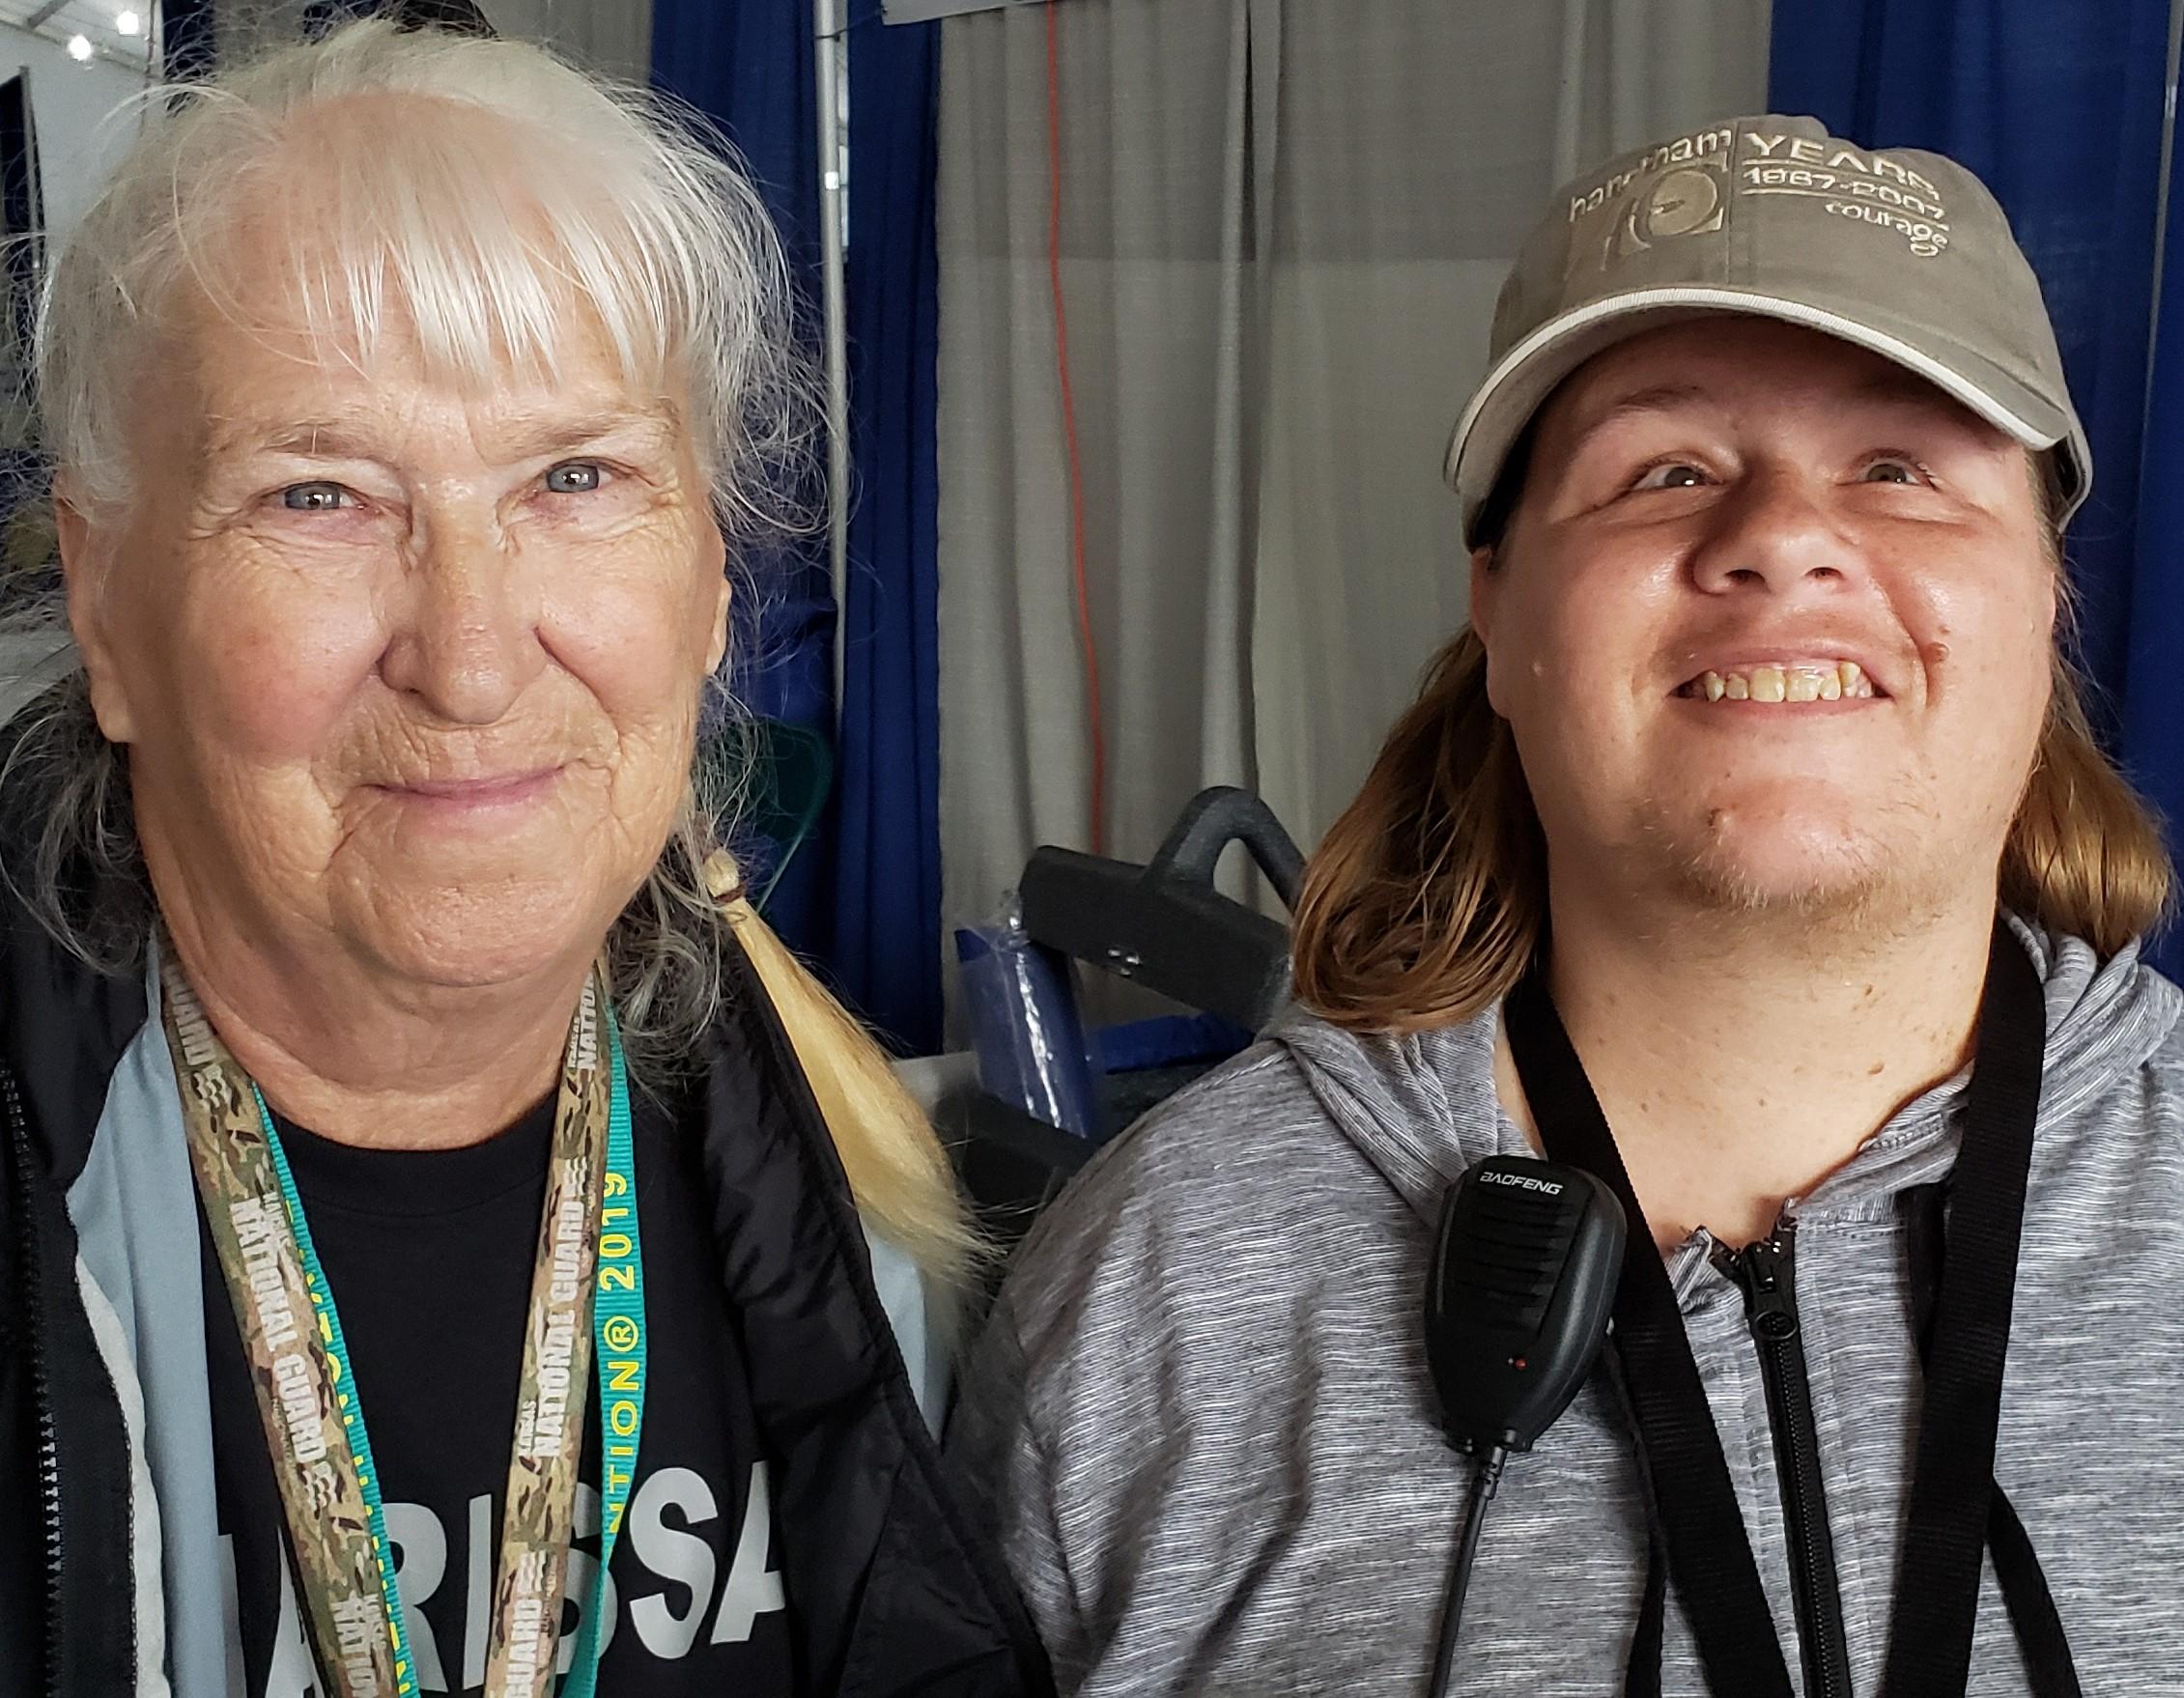 Charissa Dunham and Kelly Stanfield in the Hamvention Handiham booth